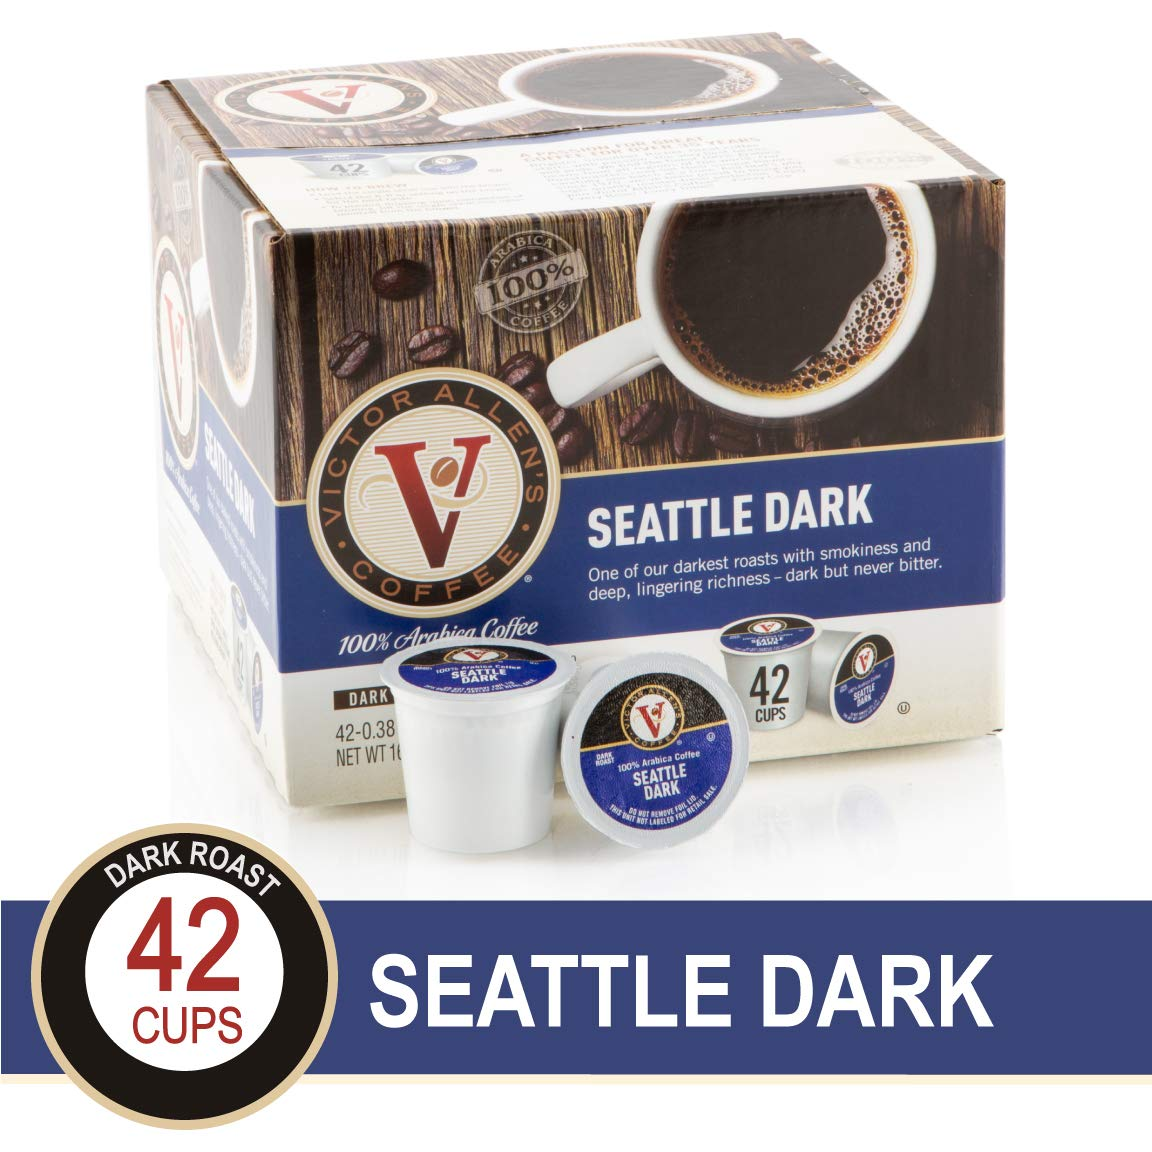 Seattle Dark for K-Cup Keurig 2.0 Brewers, 42 Count, Victor Allen's Coffee Dark Roast Single Serve Coffee Pods